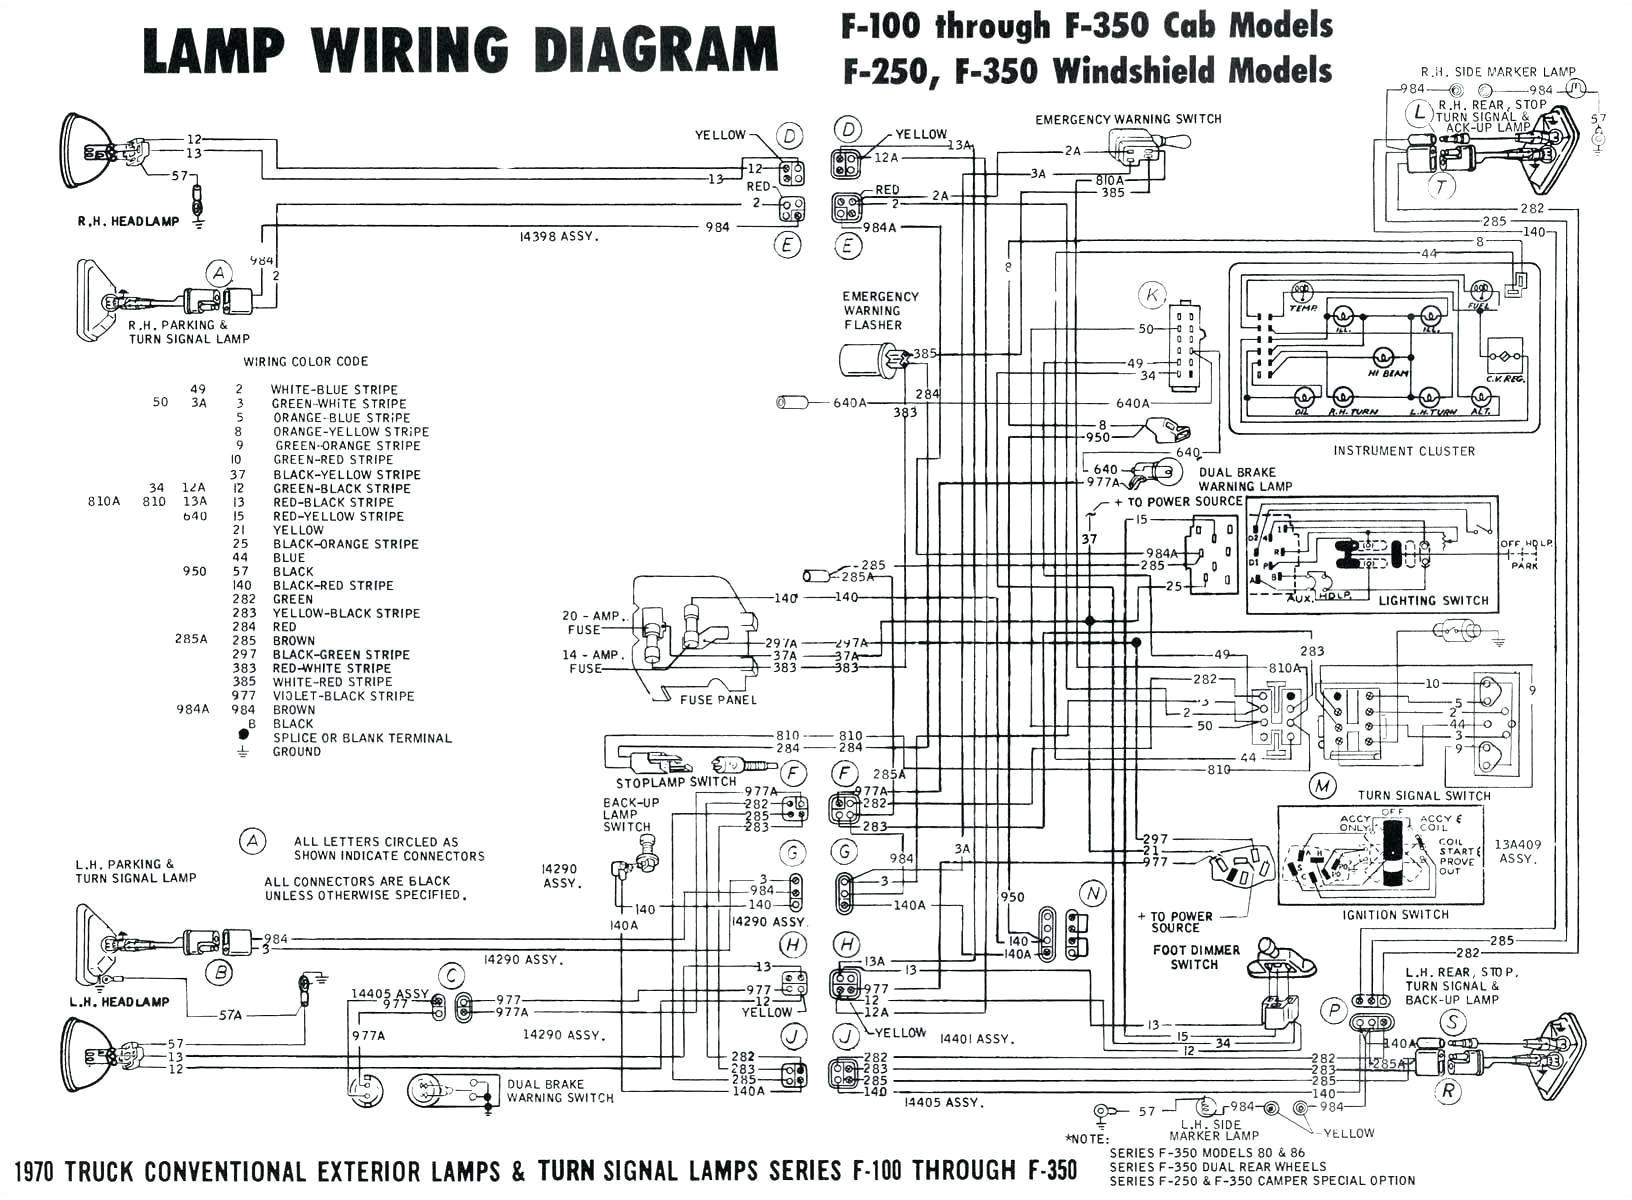 pc 8021 wiring diagram auto wiring diagram c11 pc wiring diagram